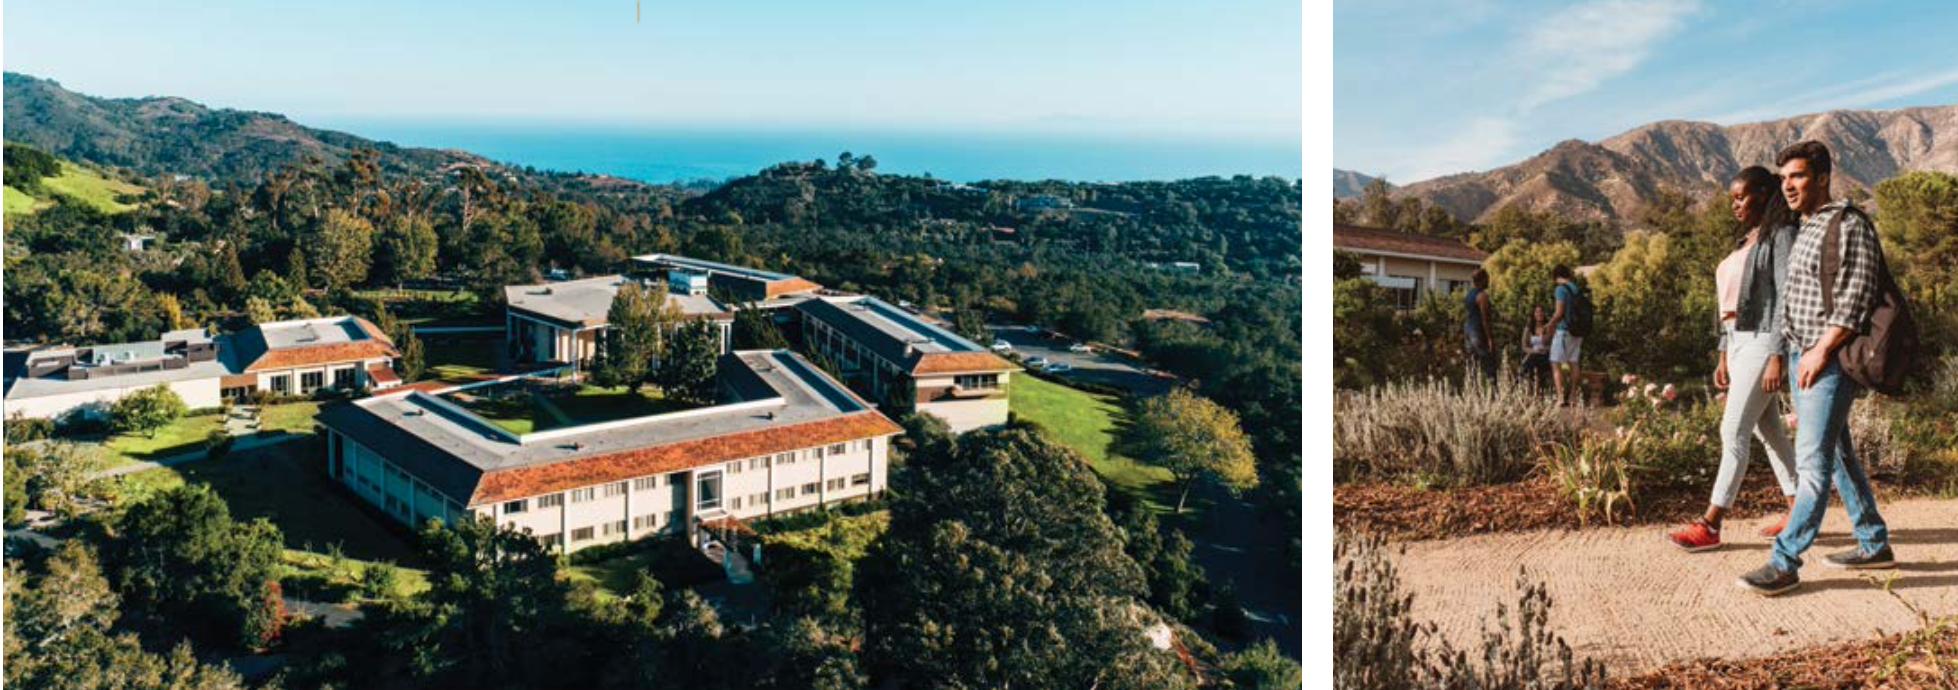 Pacifica Graduate Institute - Find Your Calling